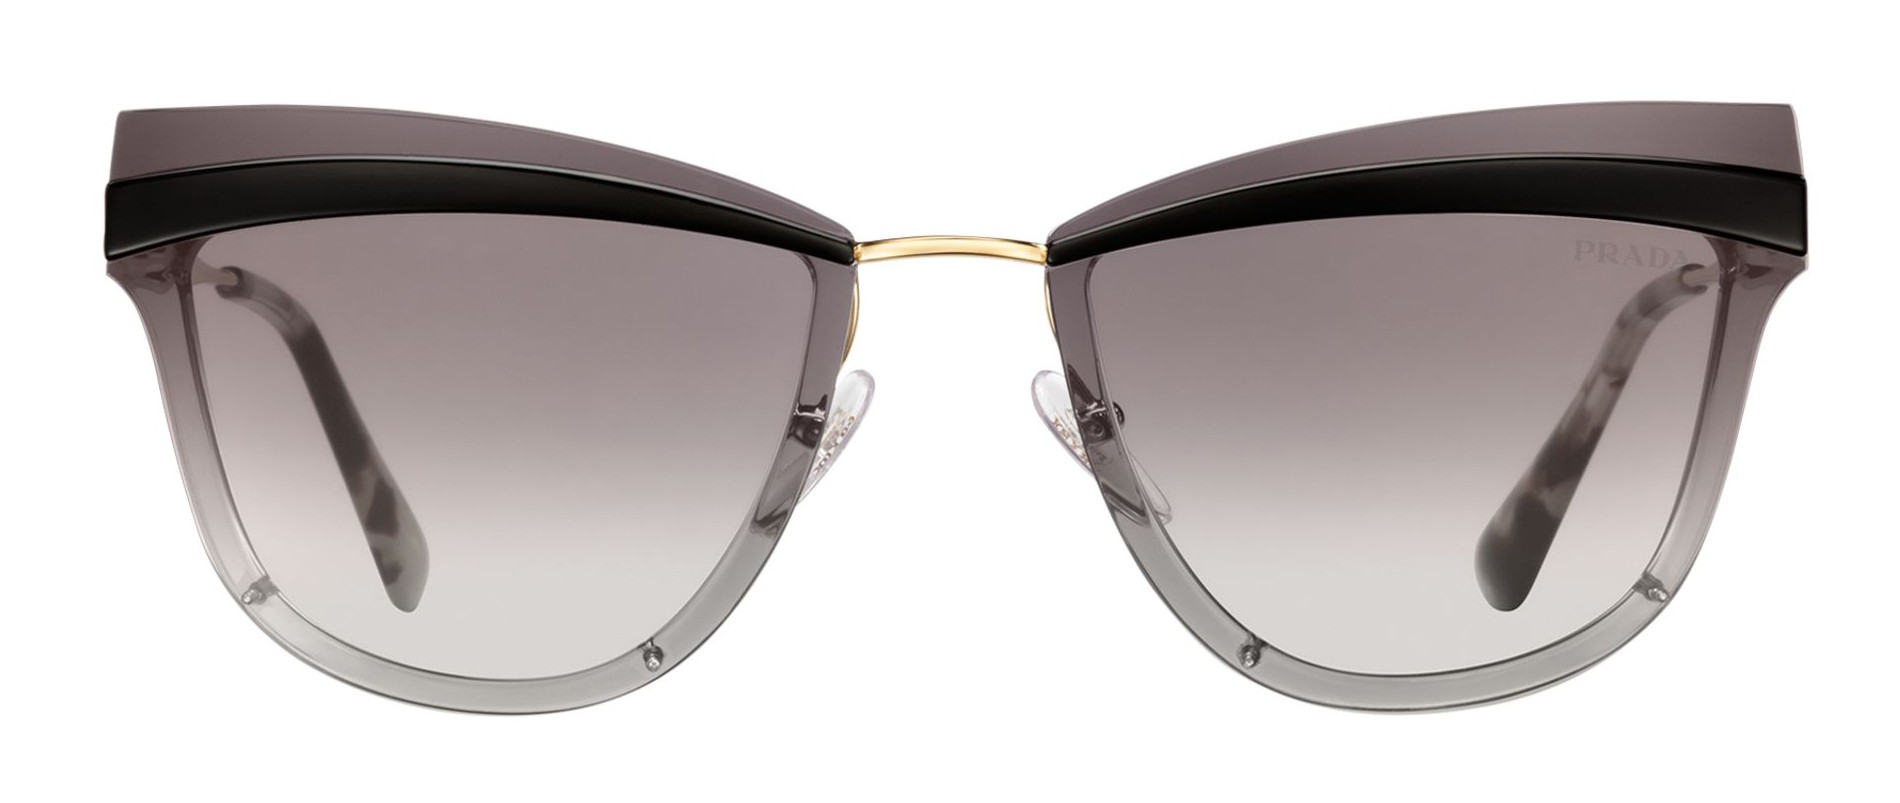 d87f6f2753 Prada - Prada Cinéma - Black   Pale Gold Cat Eye Sunglasses - Prada Cinéma  Collection - Sunglasses - Prada Eyewear